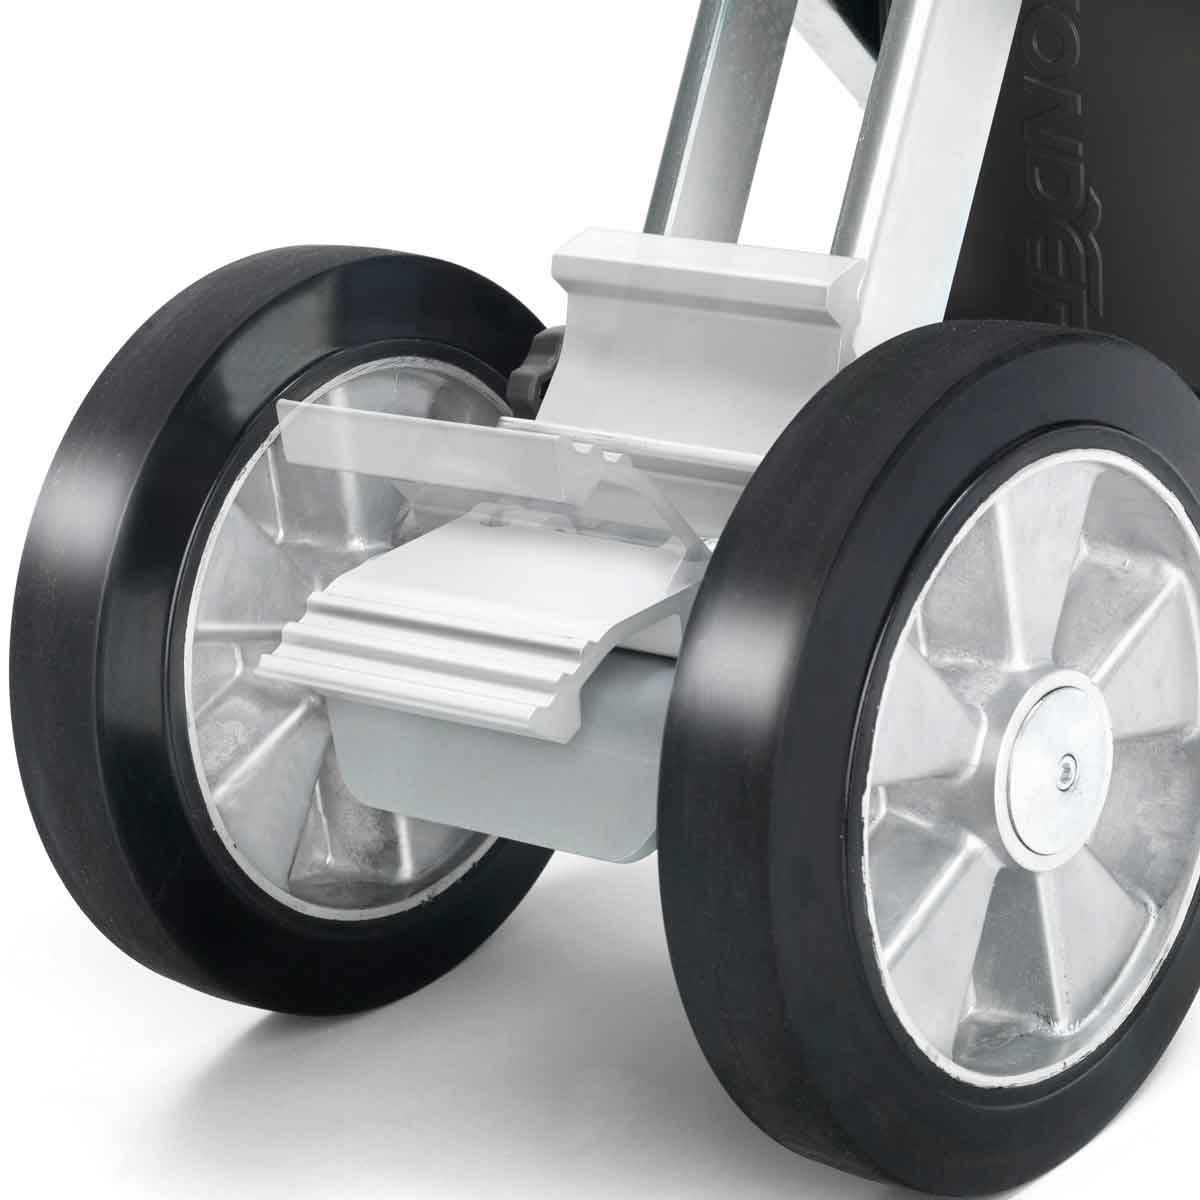 Husqvarna PG 280 Directional wheels